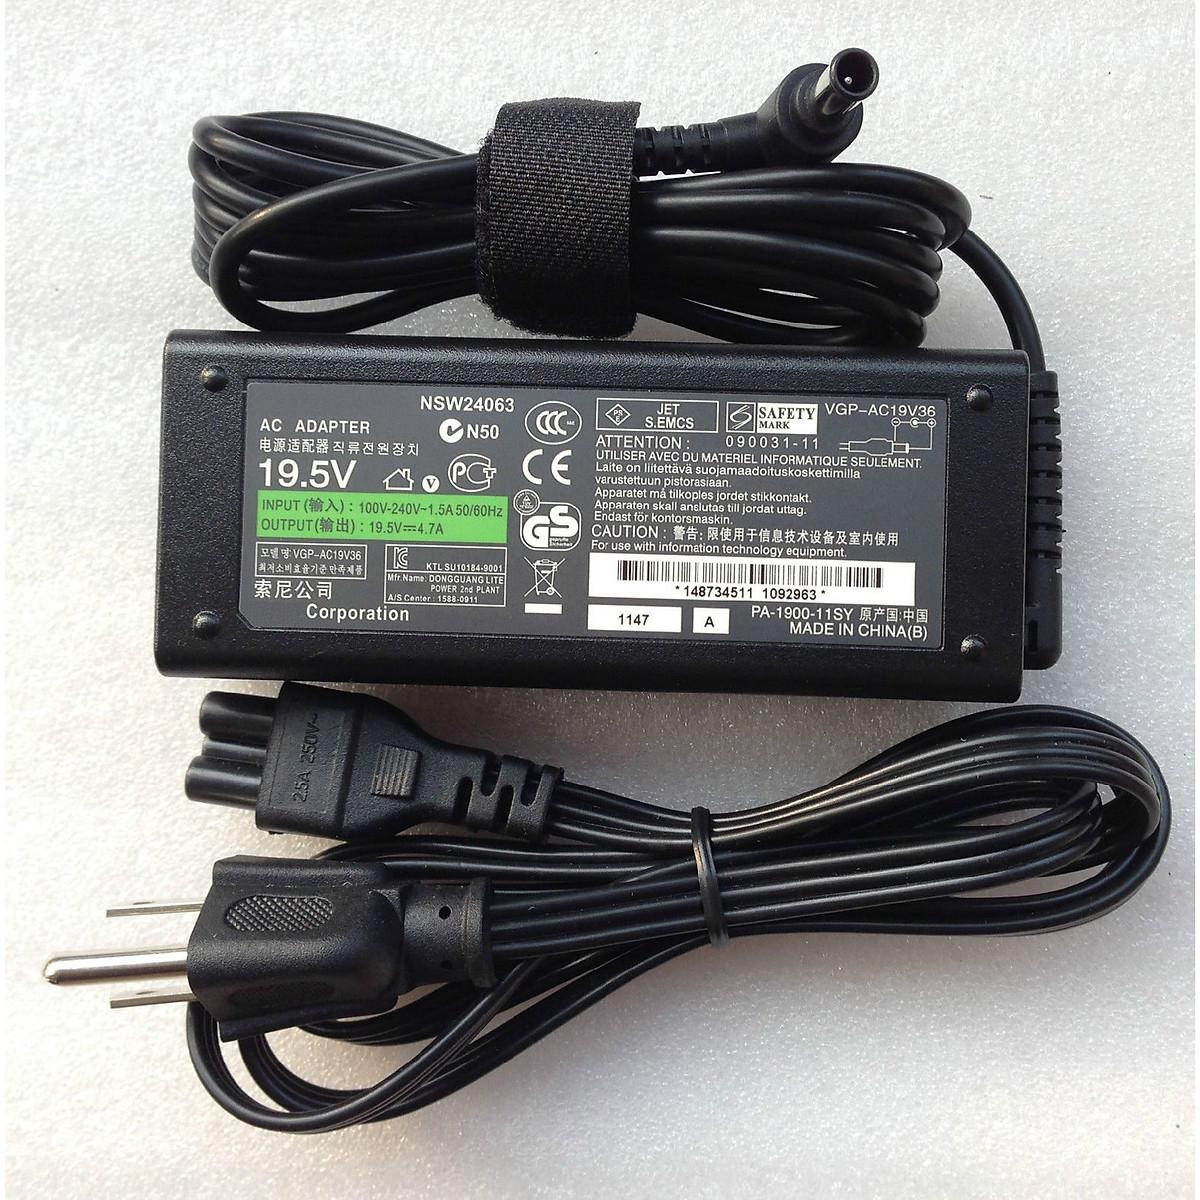 Sạc dành cho Laptop Sony PCG-71811W | Adapter Vaio PCG-71811W